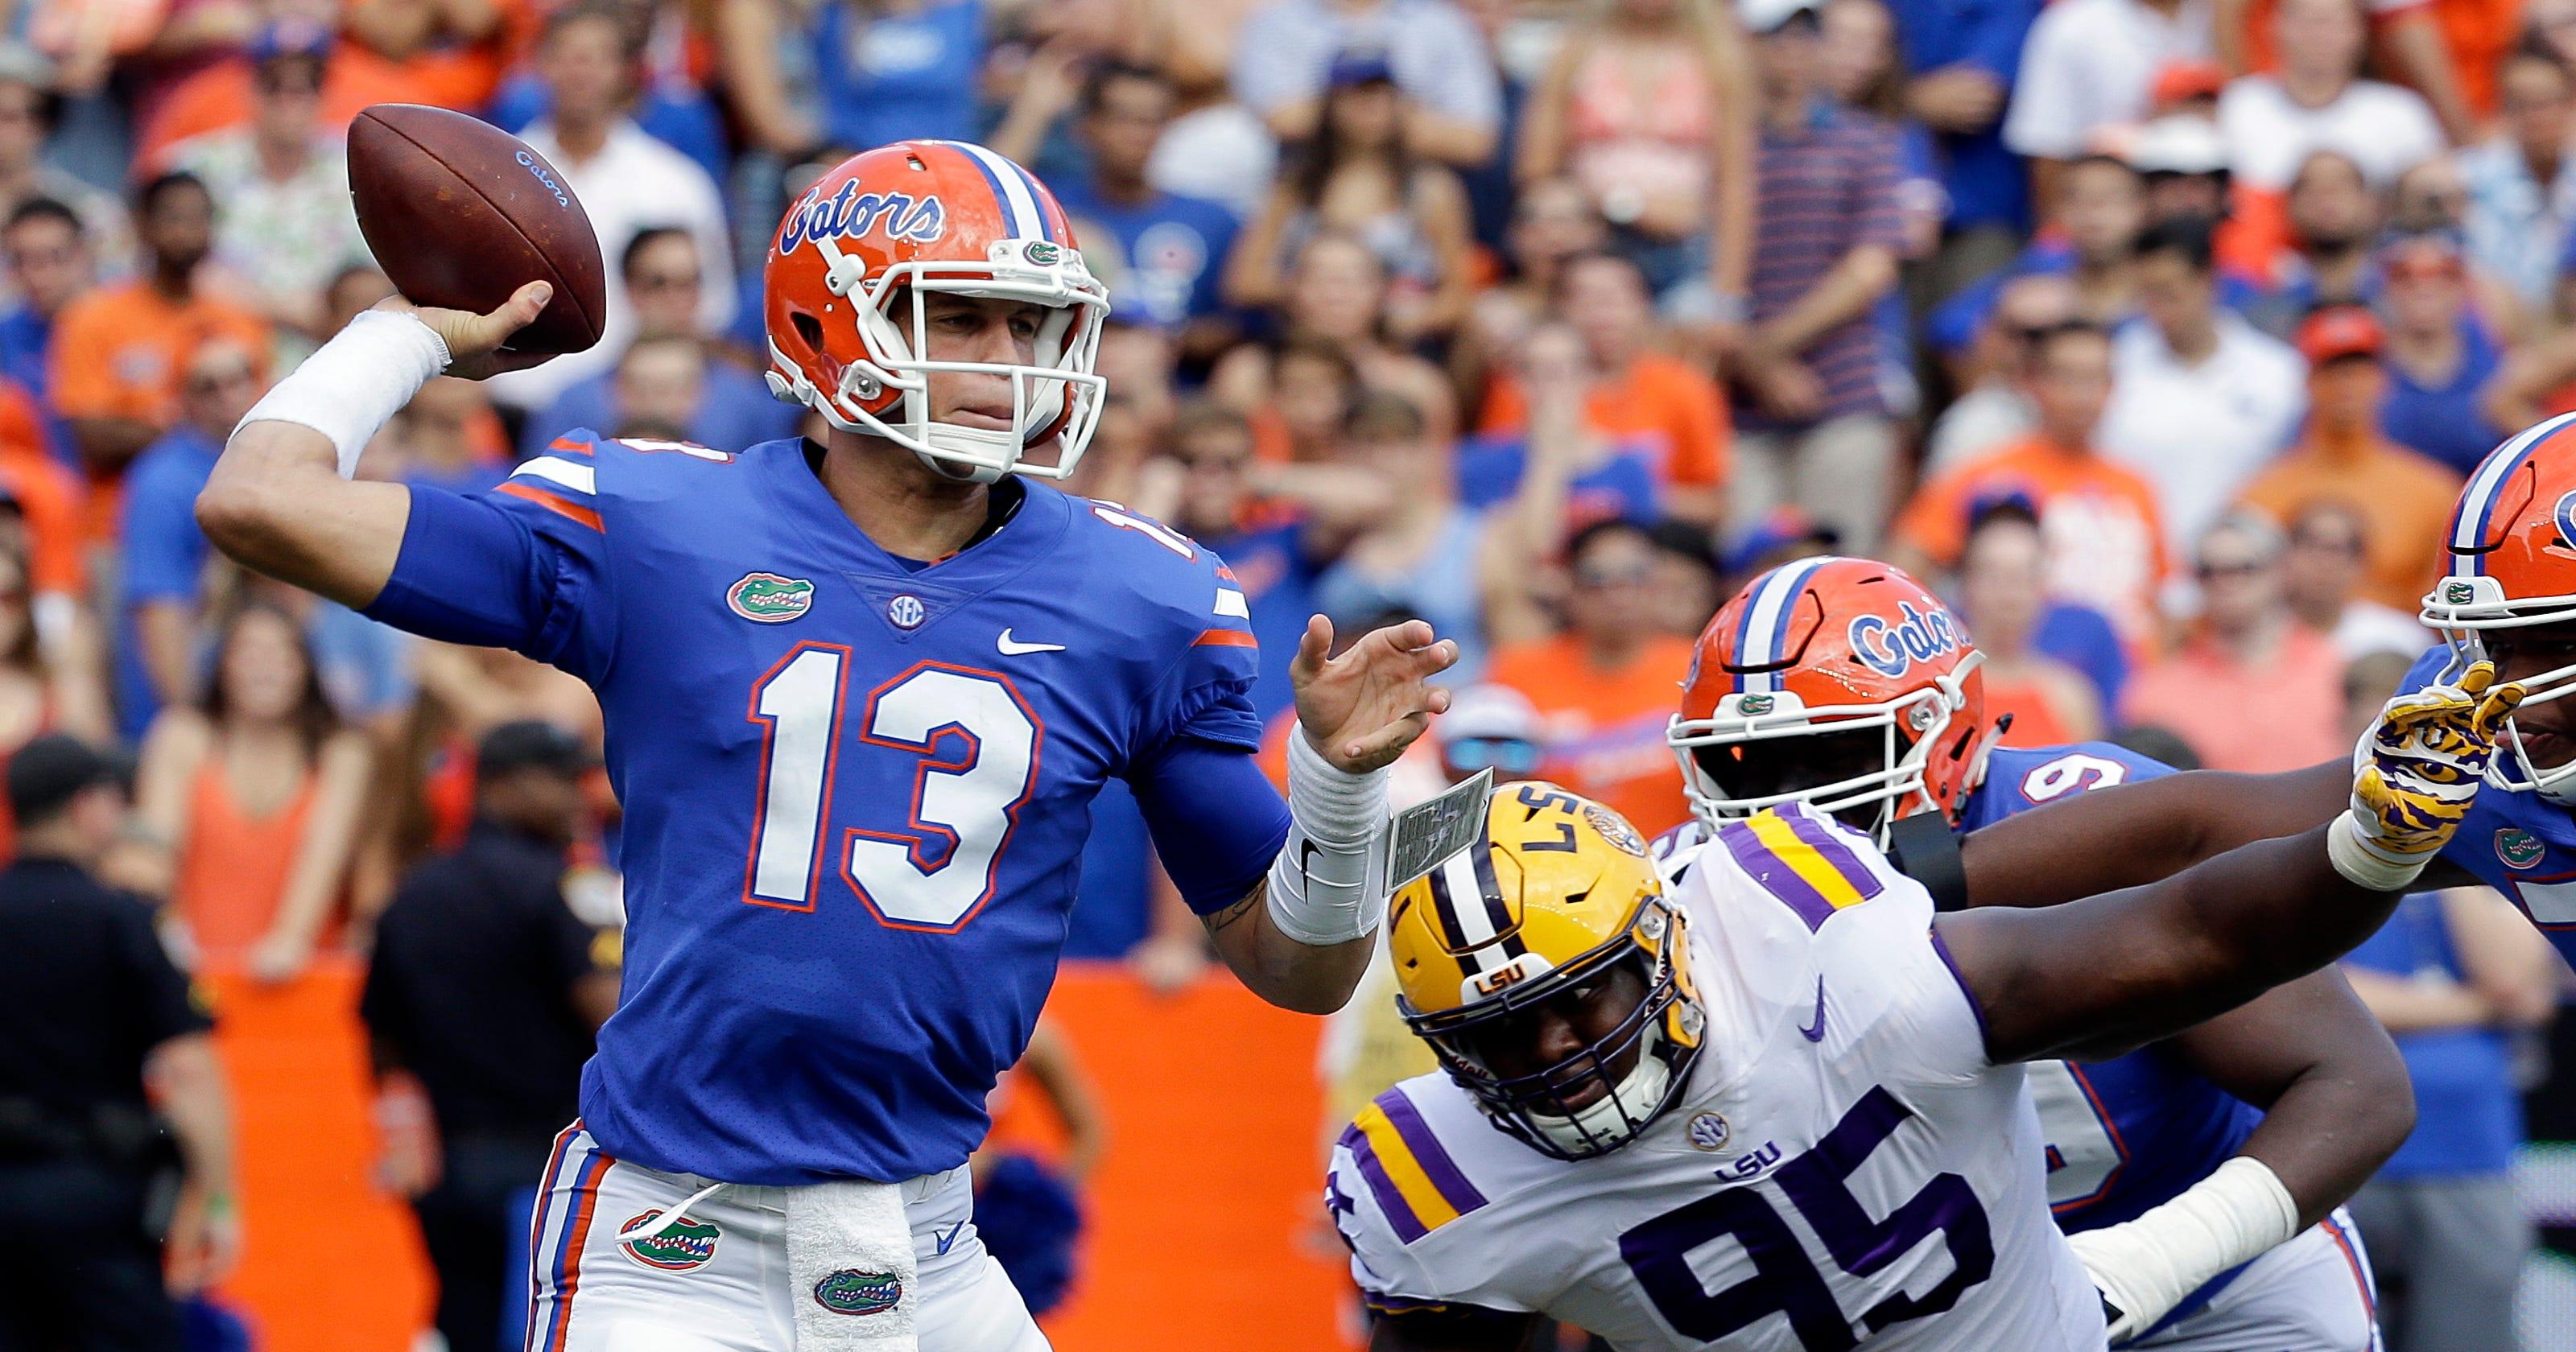 LSU football: Why Florida football team is Tigers' biggest ...